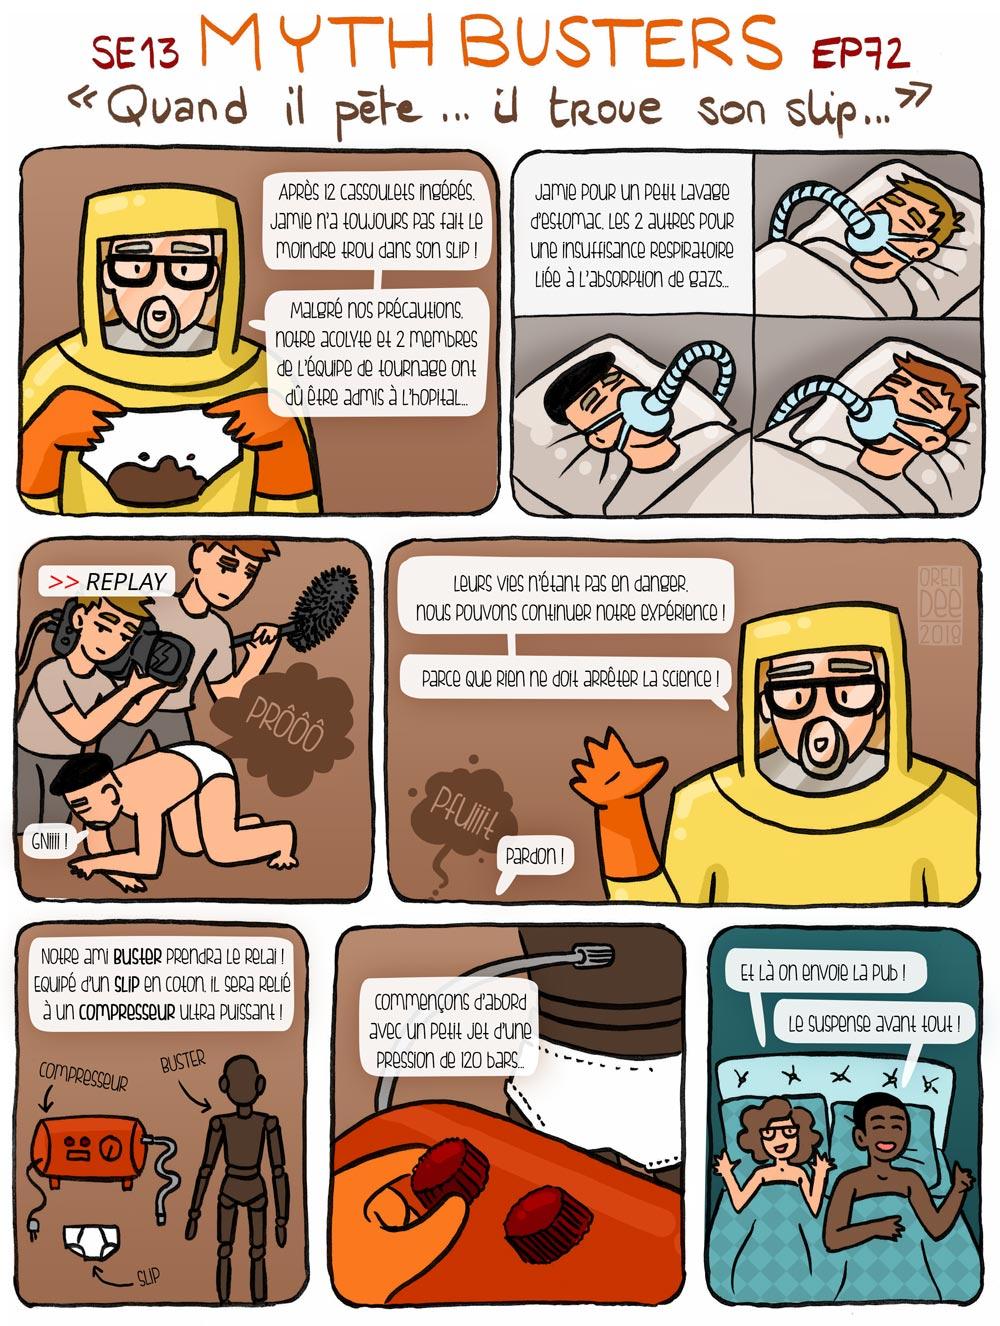 MythBusters - Quand il pète il troue son slip